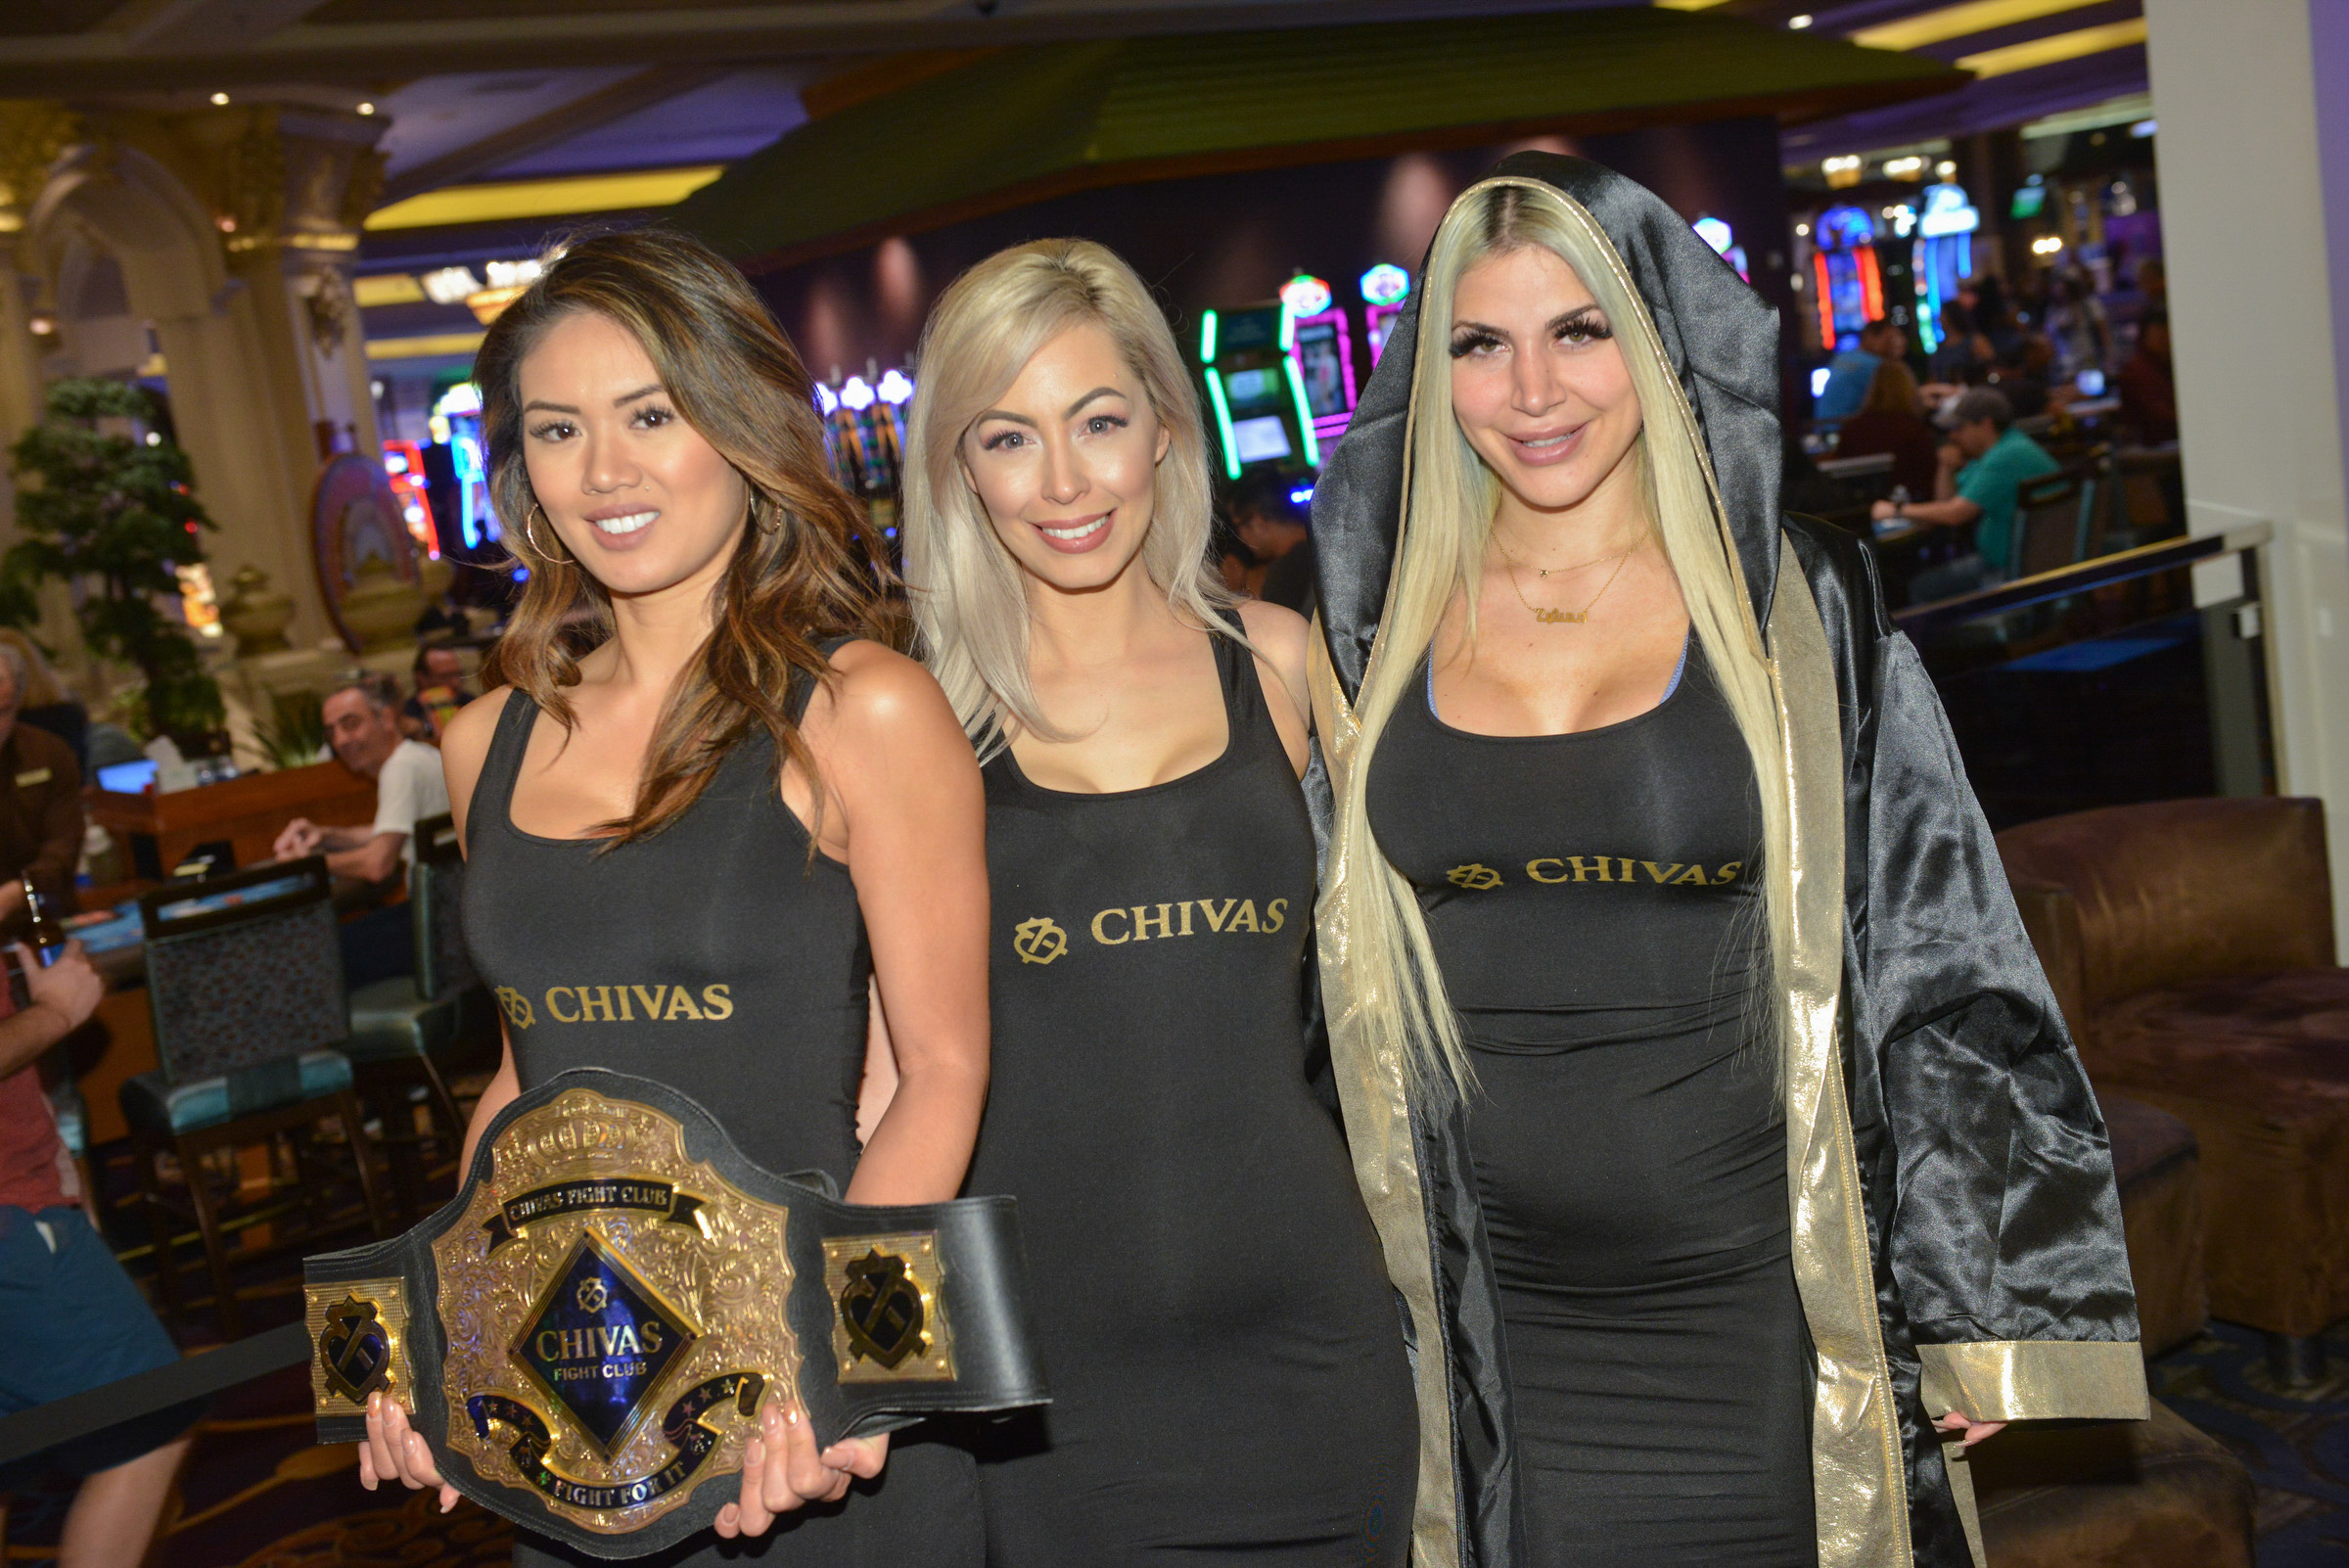 OHM-Chivas-GGG-Vegas-Top Selects-0230.jpg